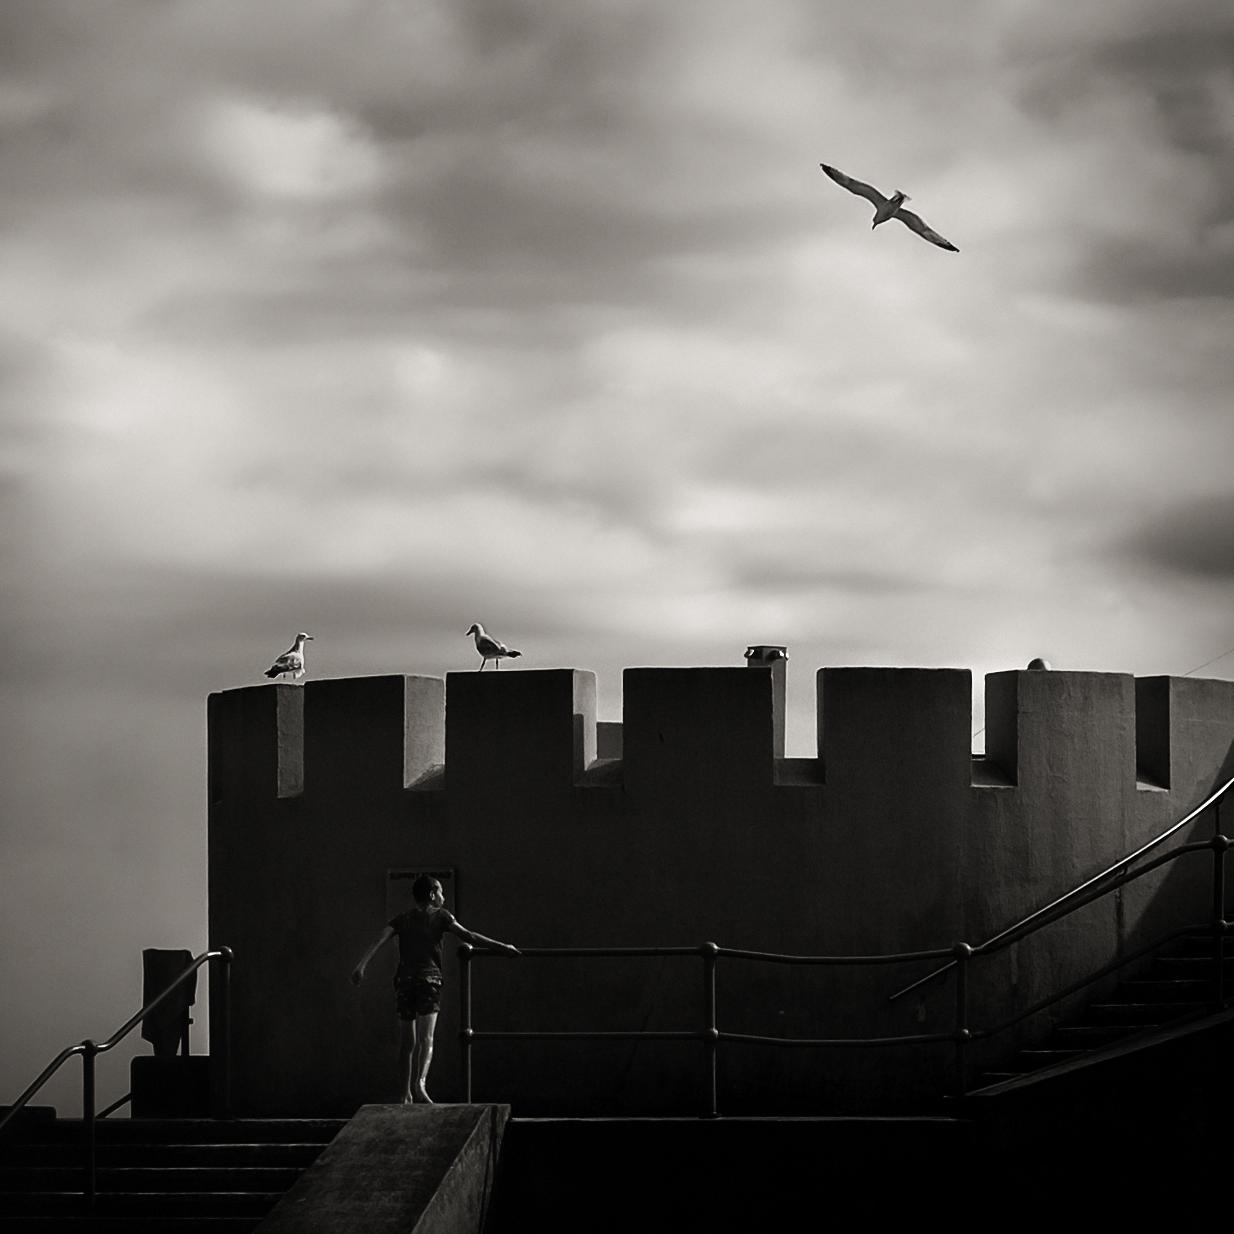 Photo in Everything else | Author Радка Пенева - Radeto | PHOTO FORUM